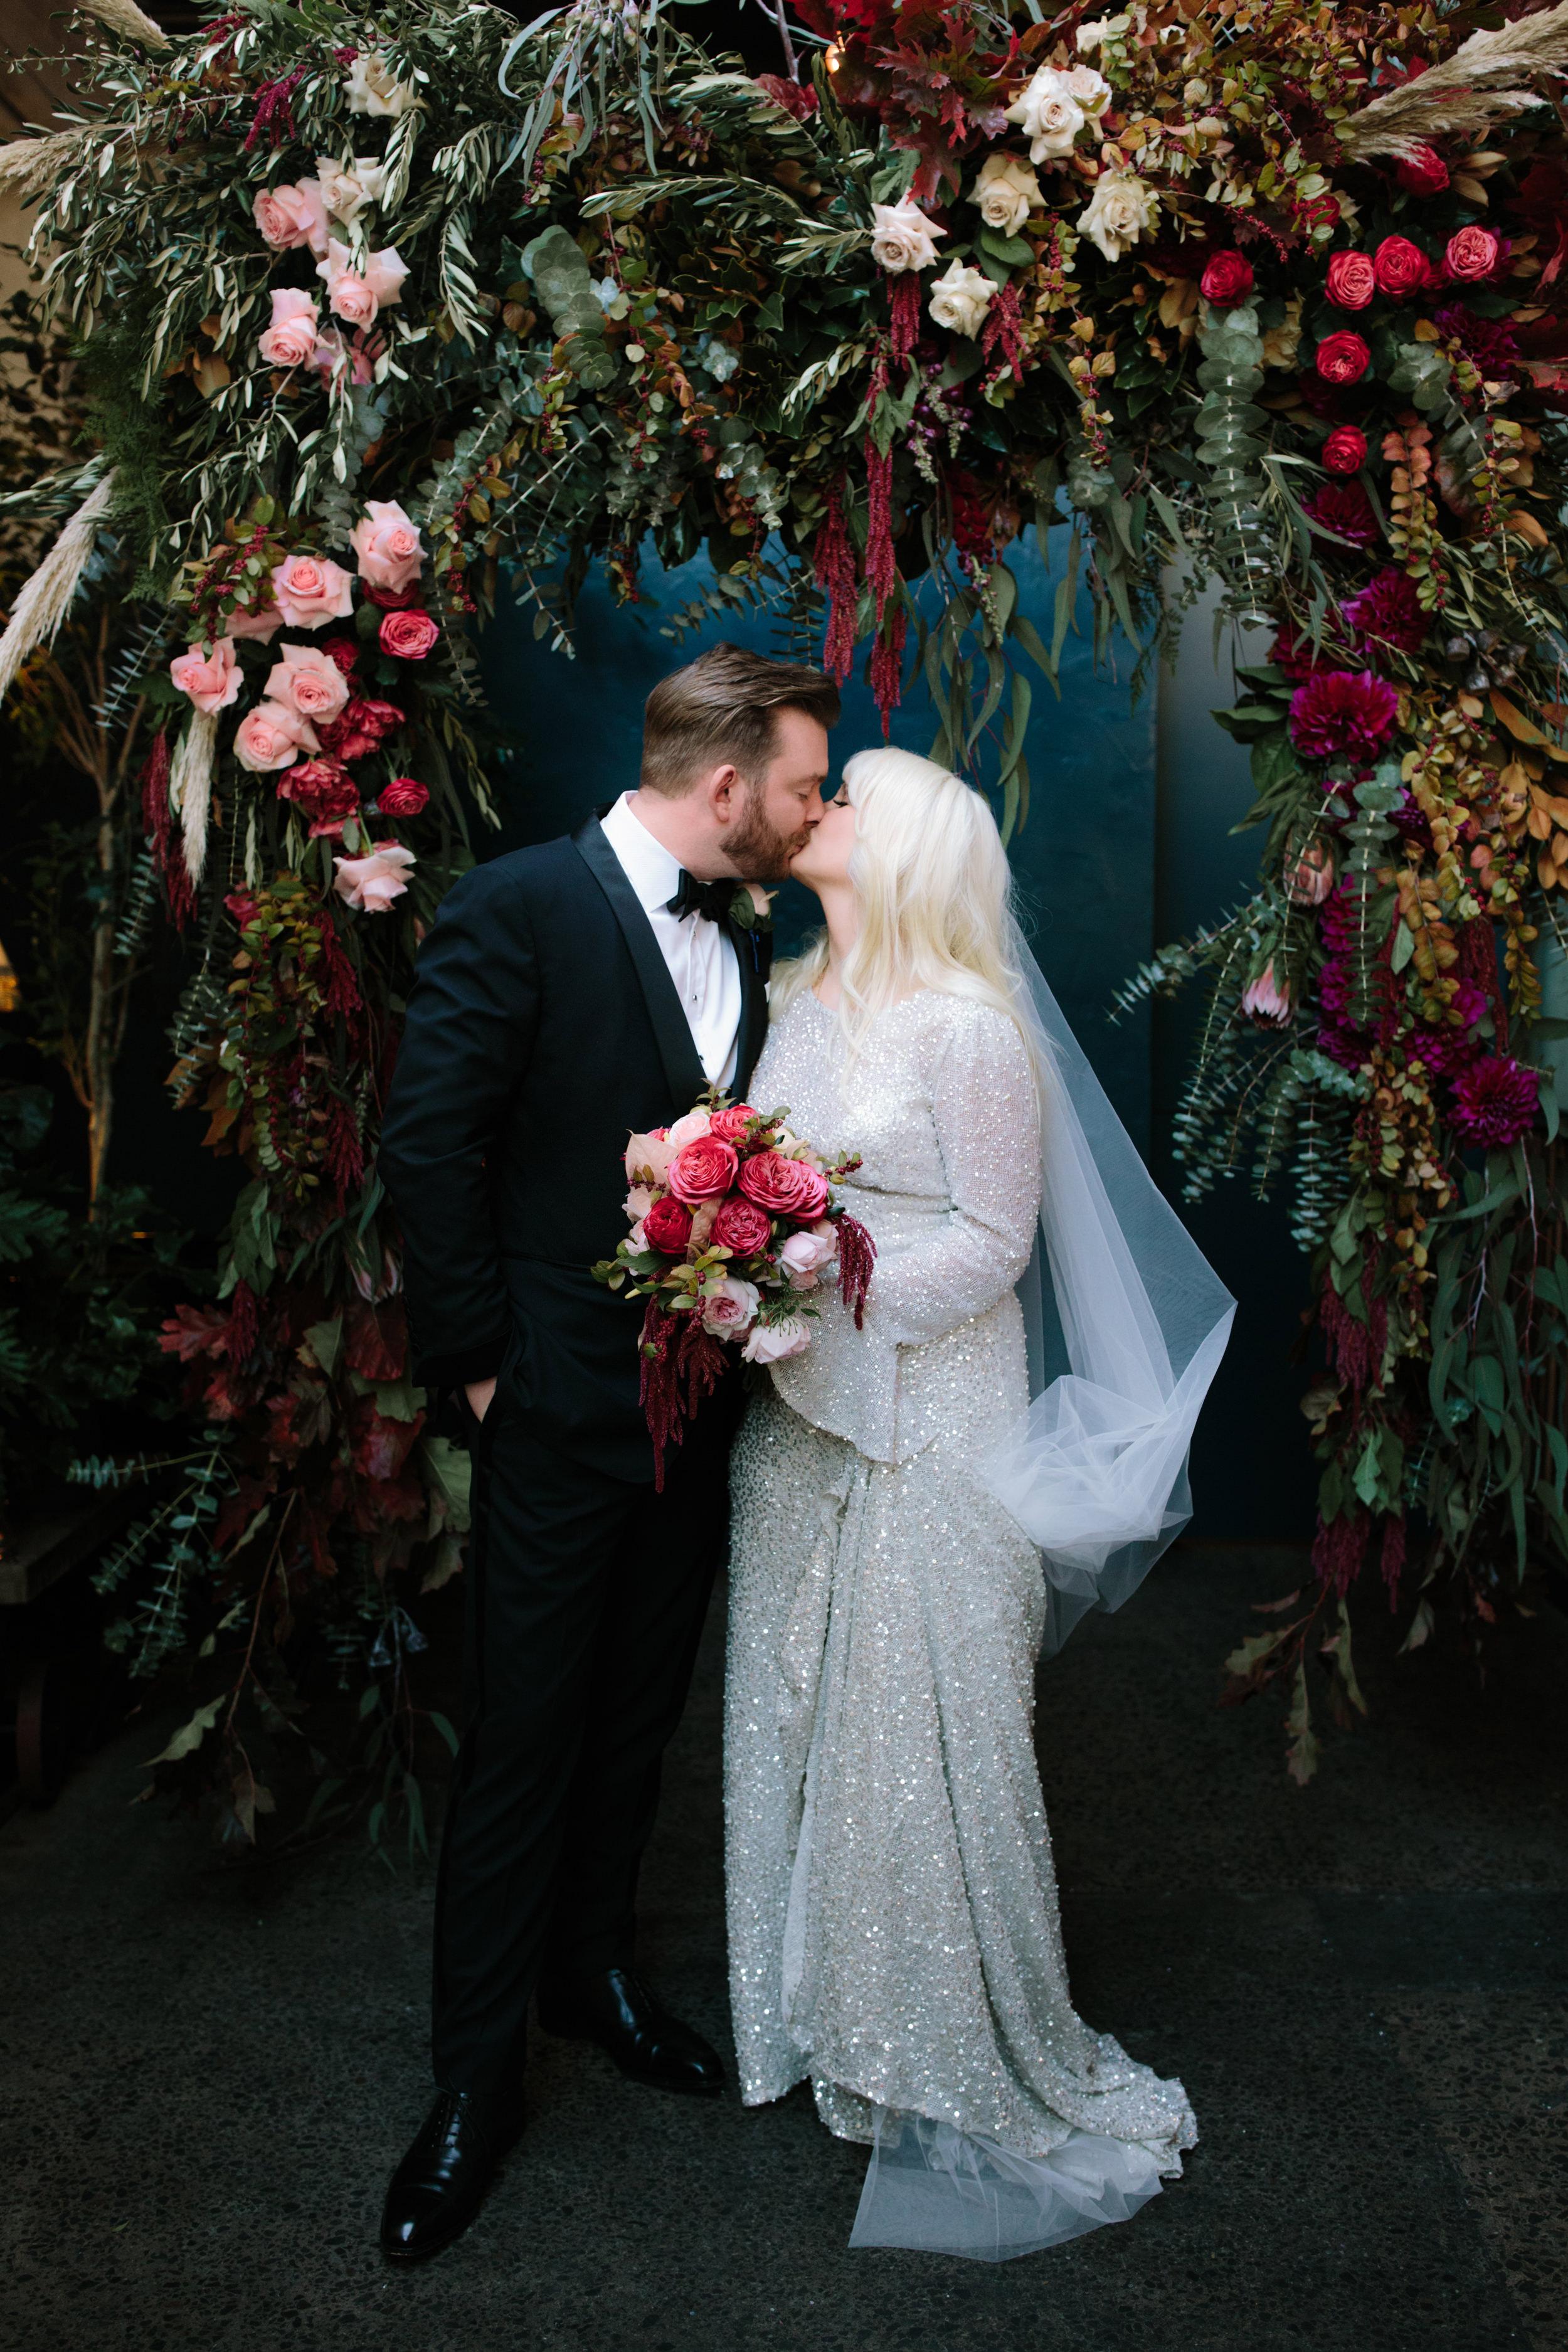 I-Got-You-Babe-Weddings-Tori-Will-Rupert0062.JPG